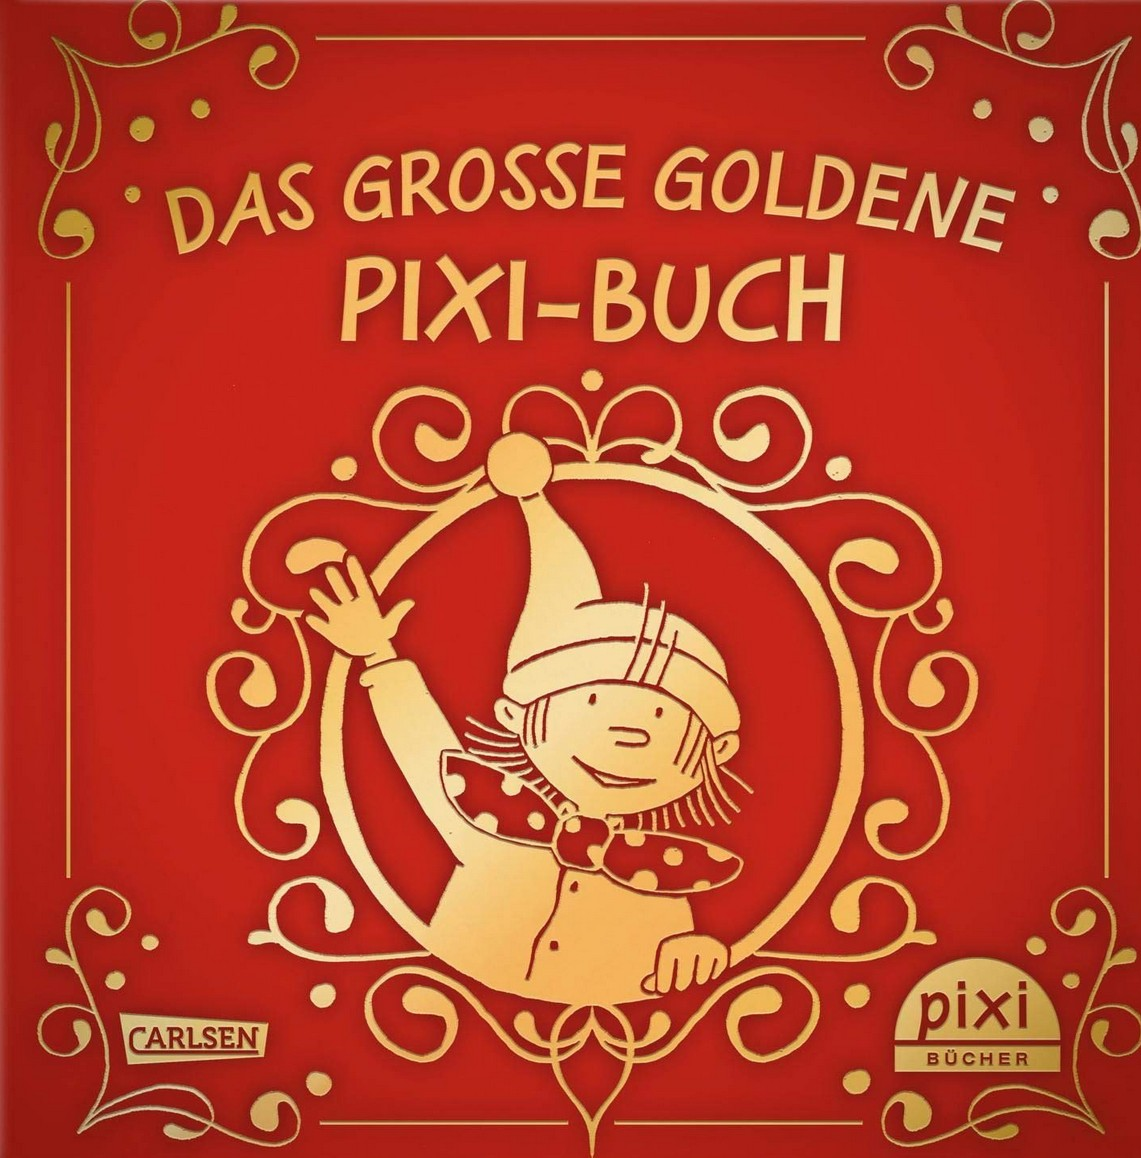 Das Große Goldene Pixi Buch Kinderbuchlesende